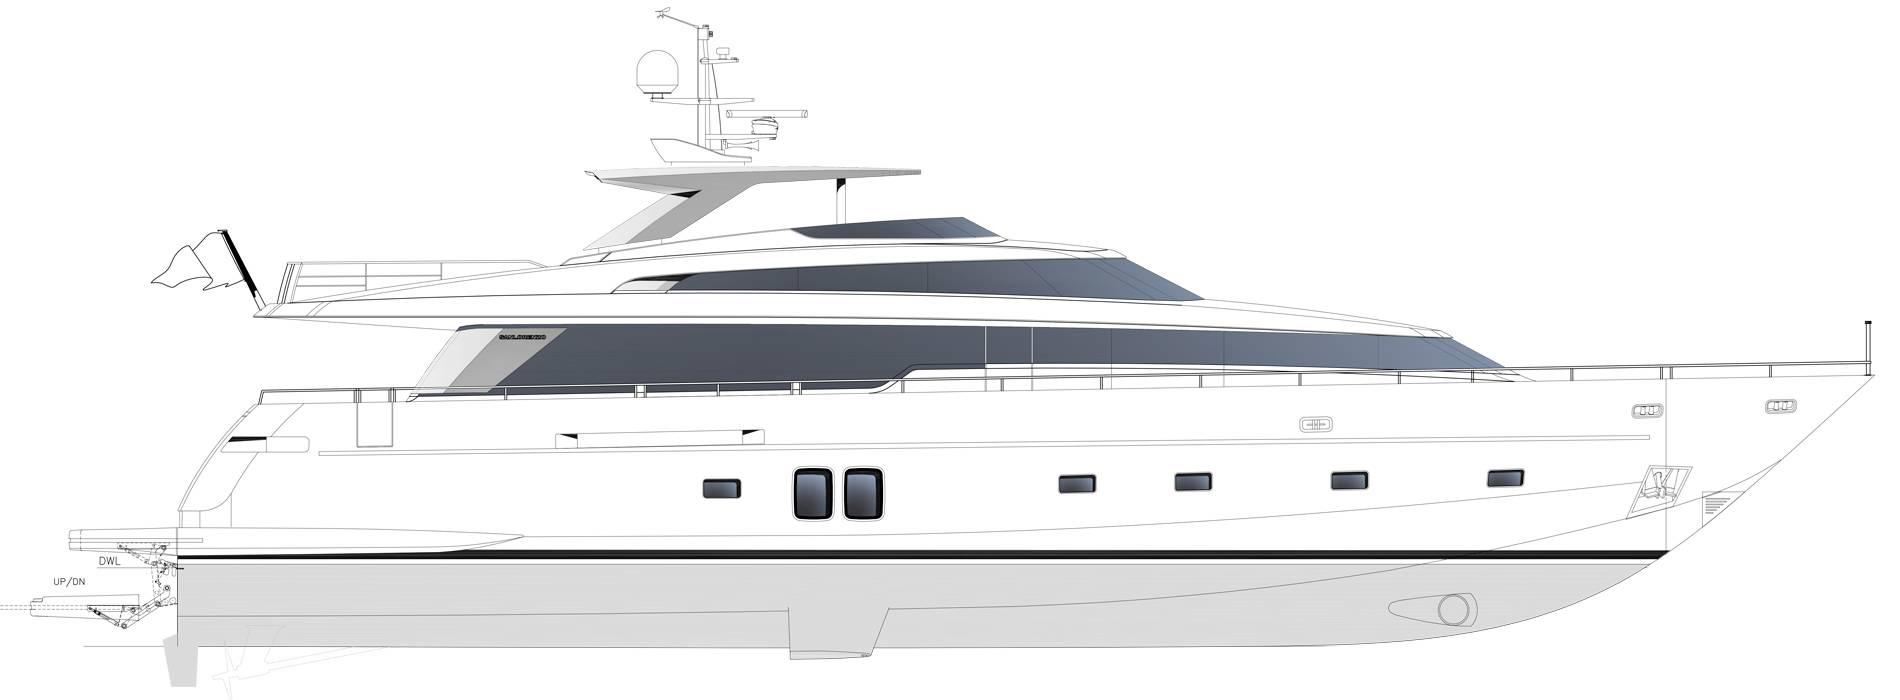 Sanlorenzo Yachts SL96-635 Profil